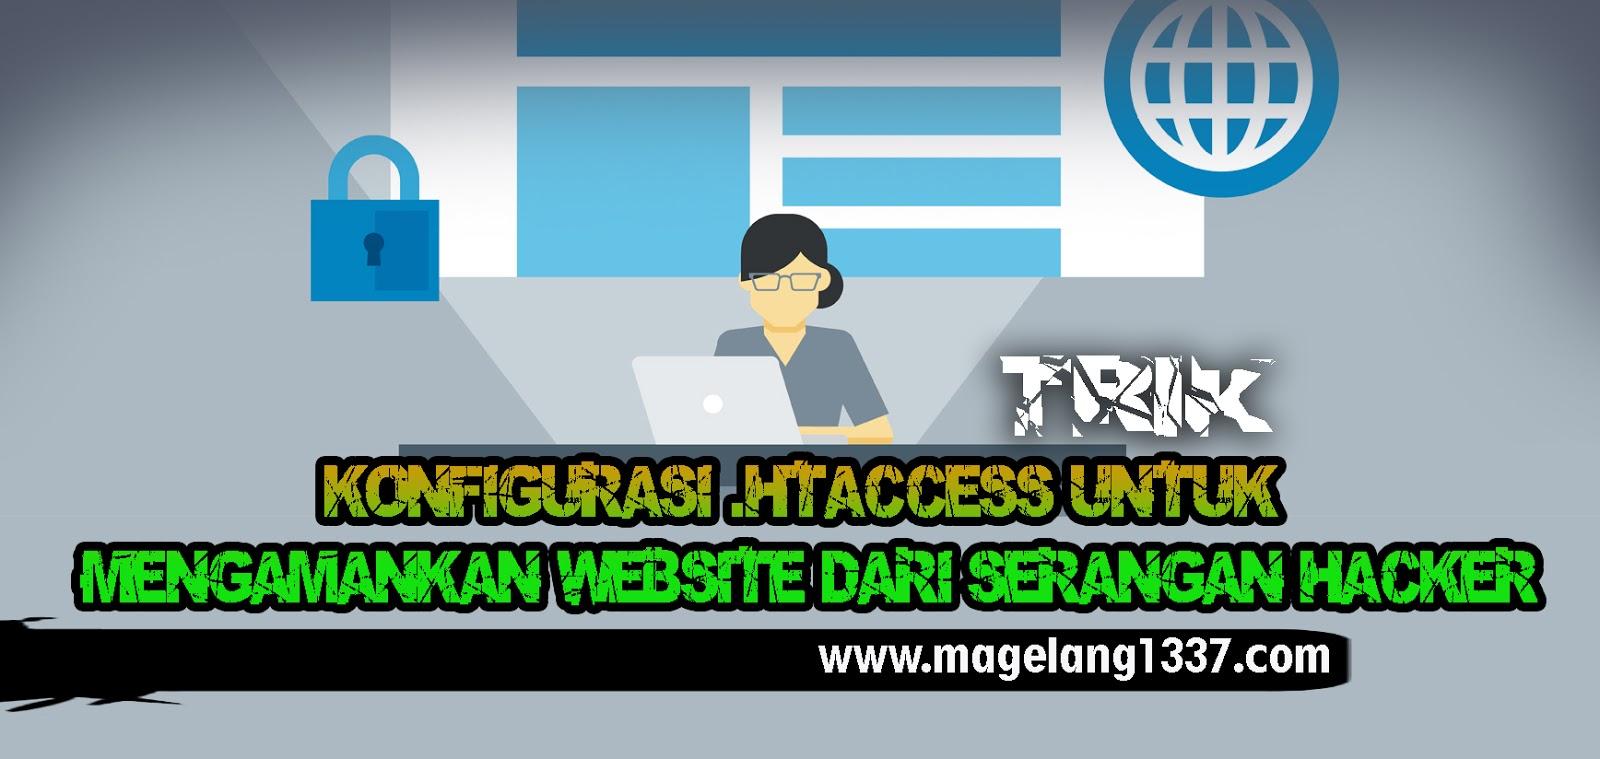 Konfigurasi  Htaccess Untuk Mengamankan Website Dari